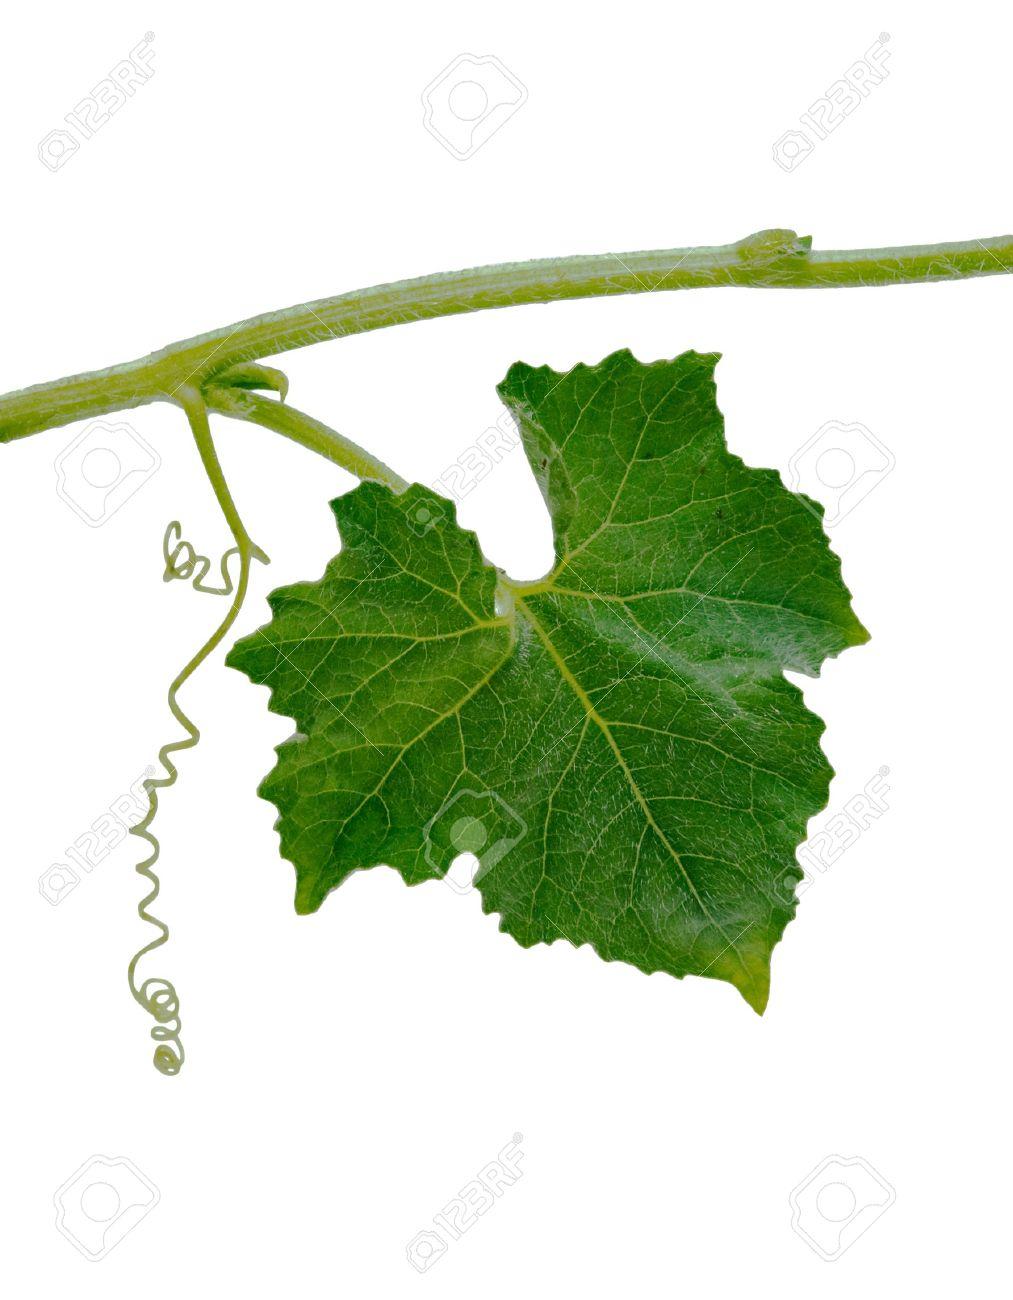 Pumpkin leaf isolated on white background Stock Photo - 5044507